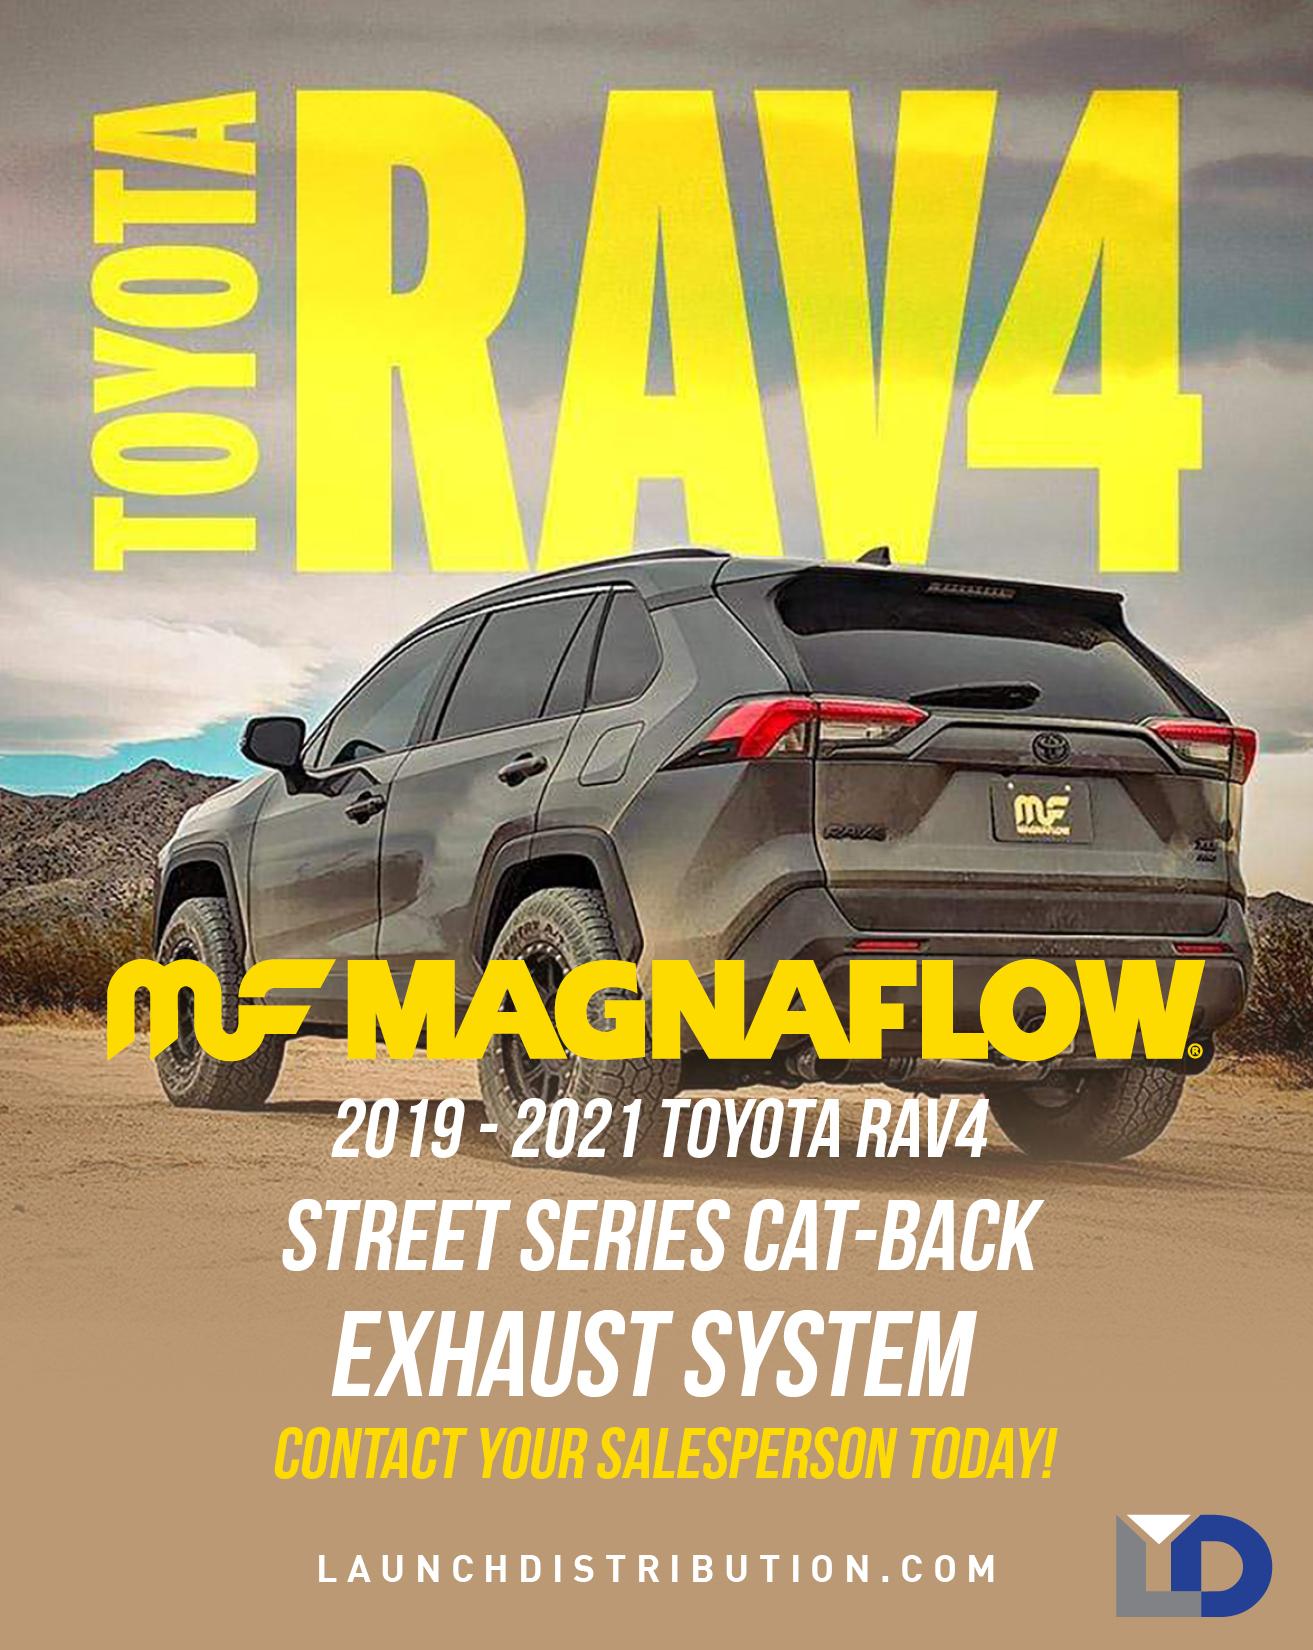 Magnaflow Street Series Exhaust for Toyota RAV4